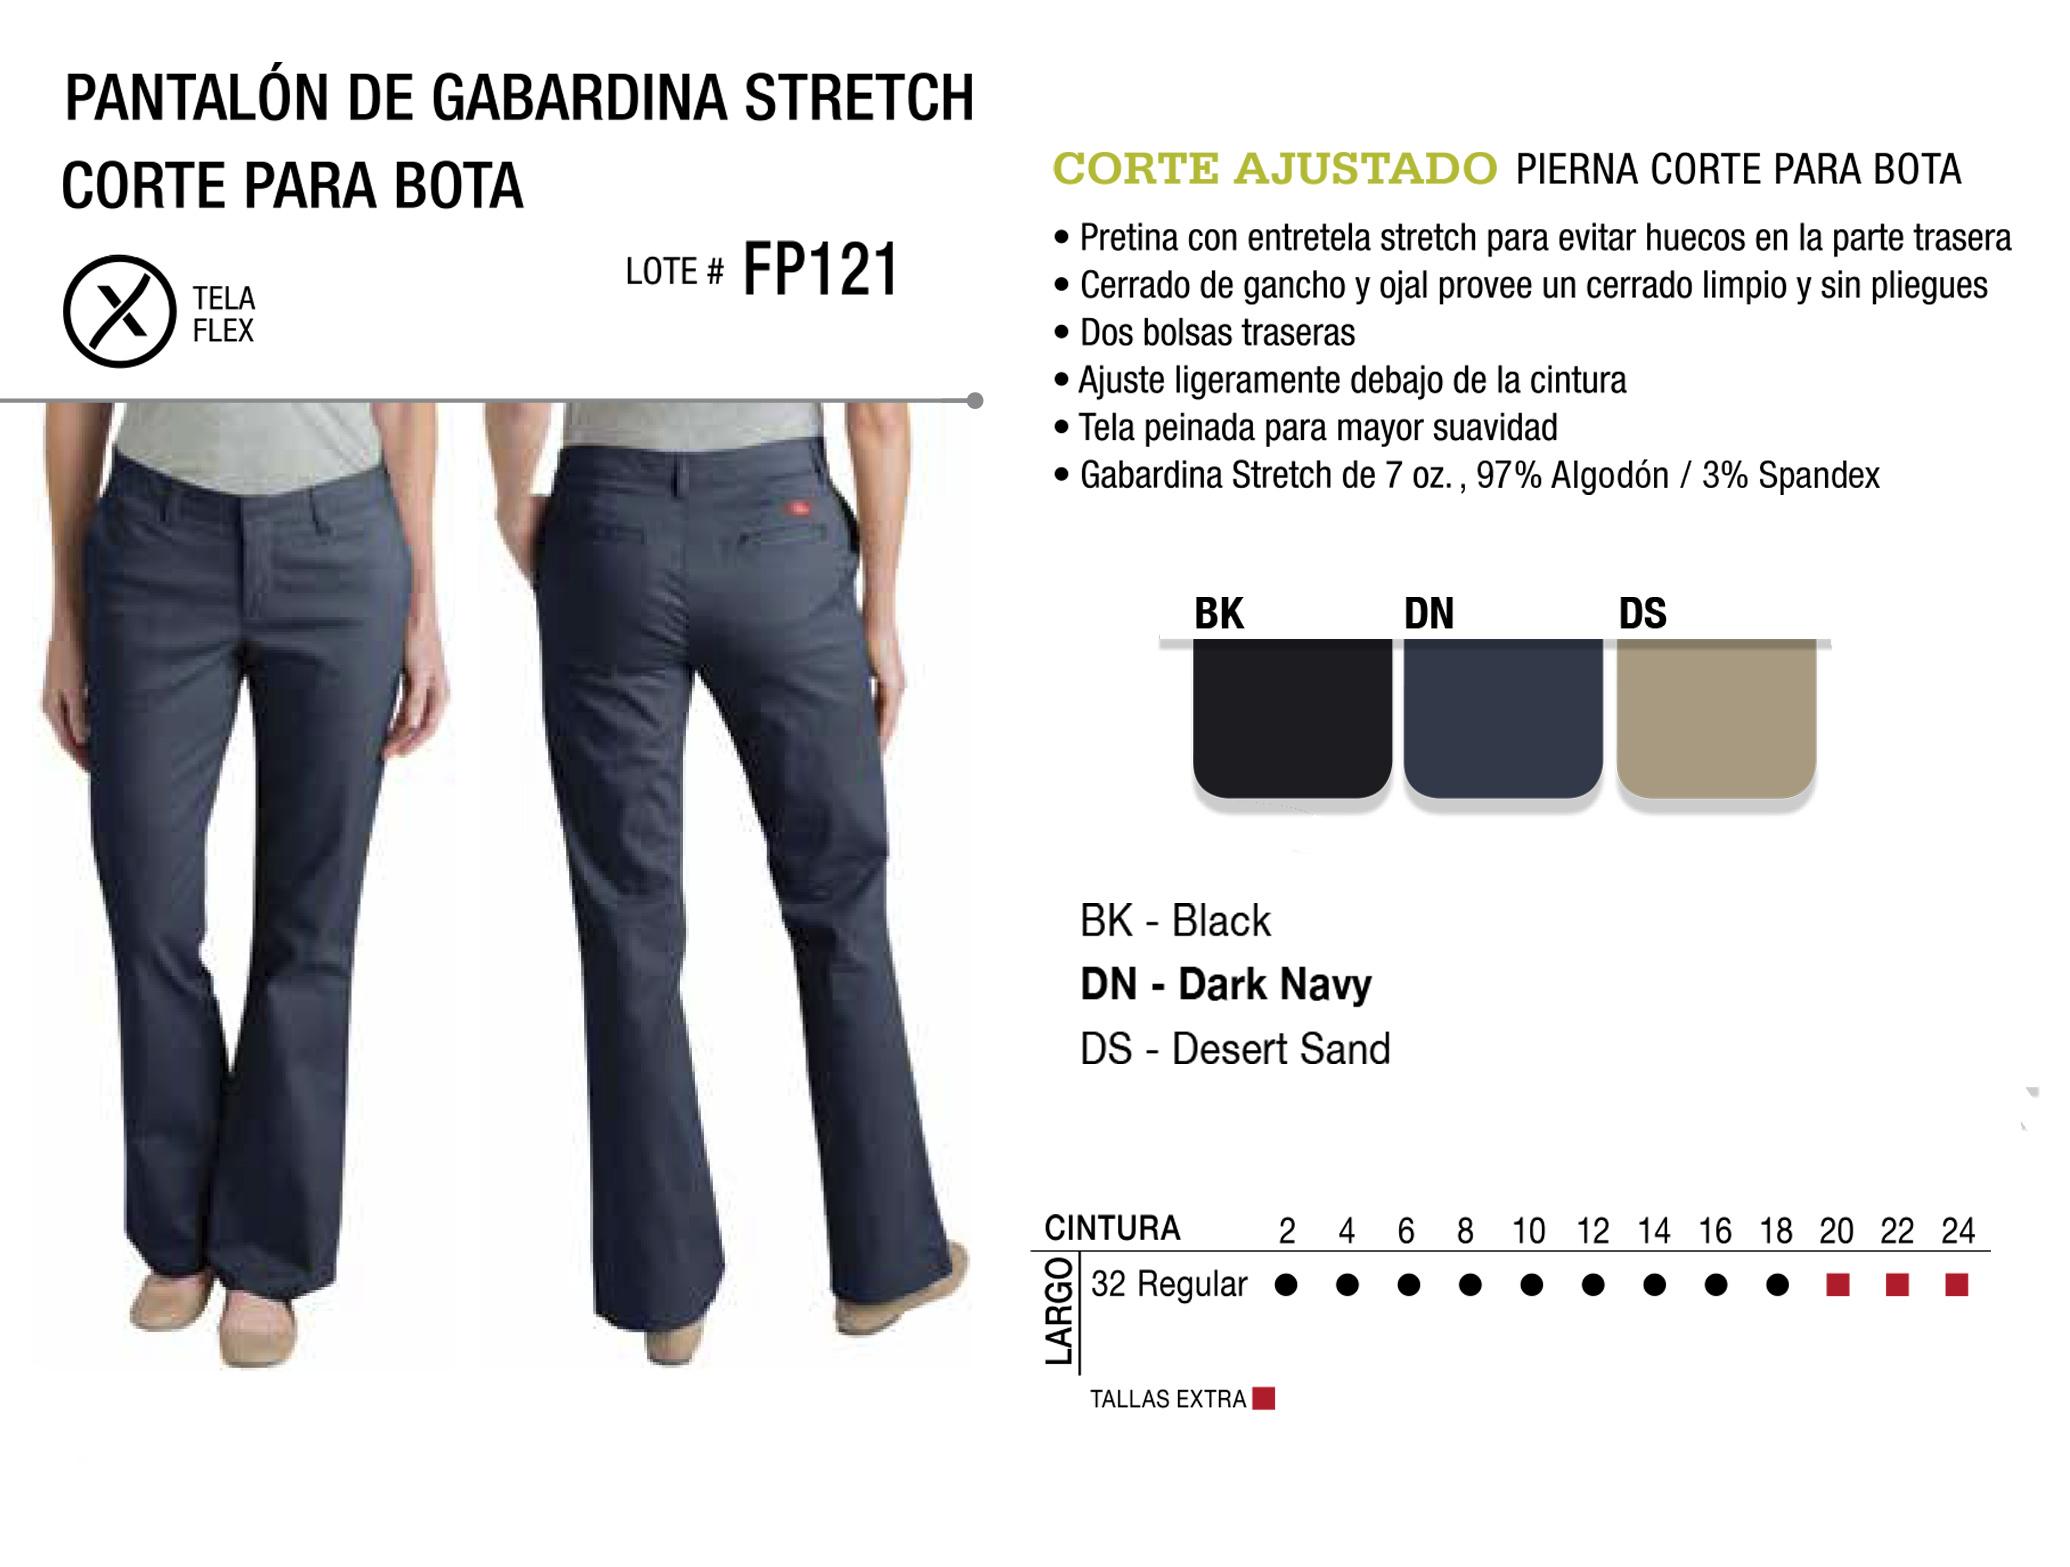 Pantalón de Gabardina Stretch. Corte Ajustado. FP121.